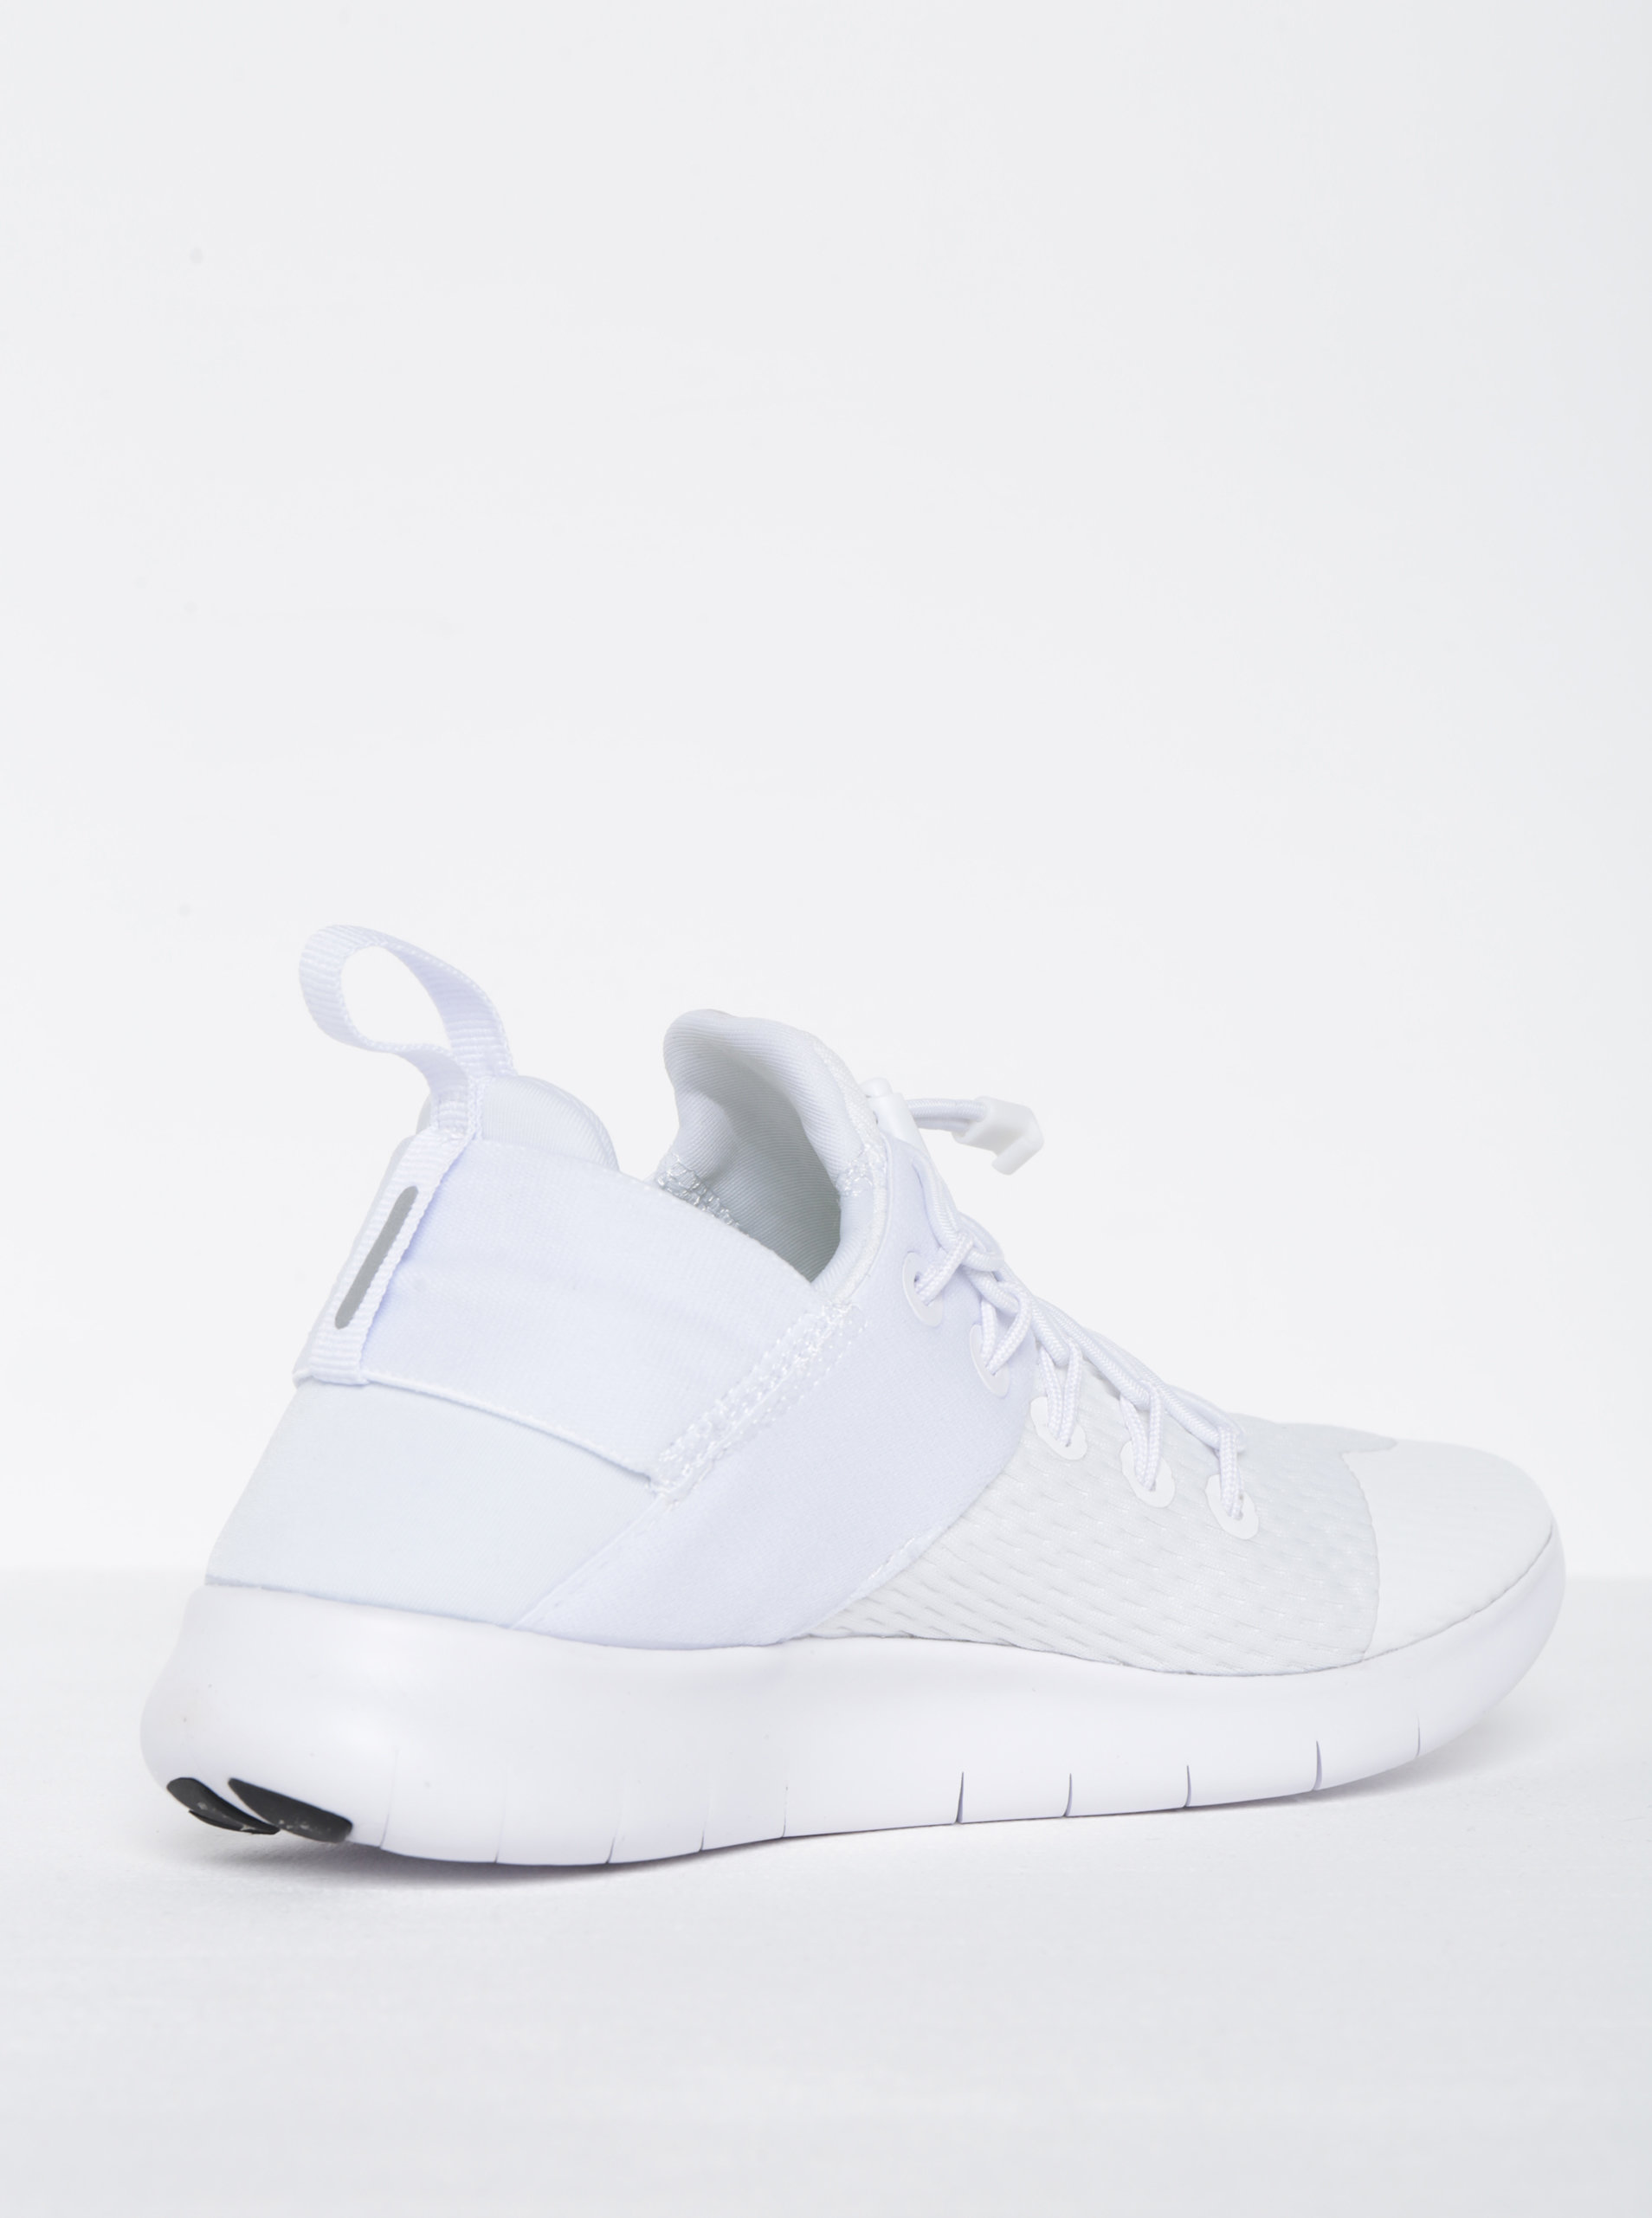 Biele dámske tenisky Nike Free Commuter ... 6a142f7a75a